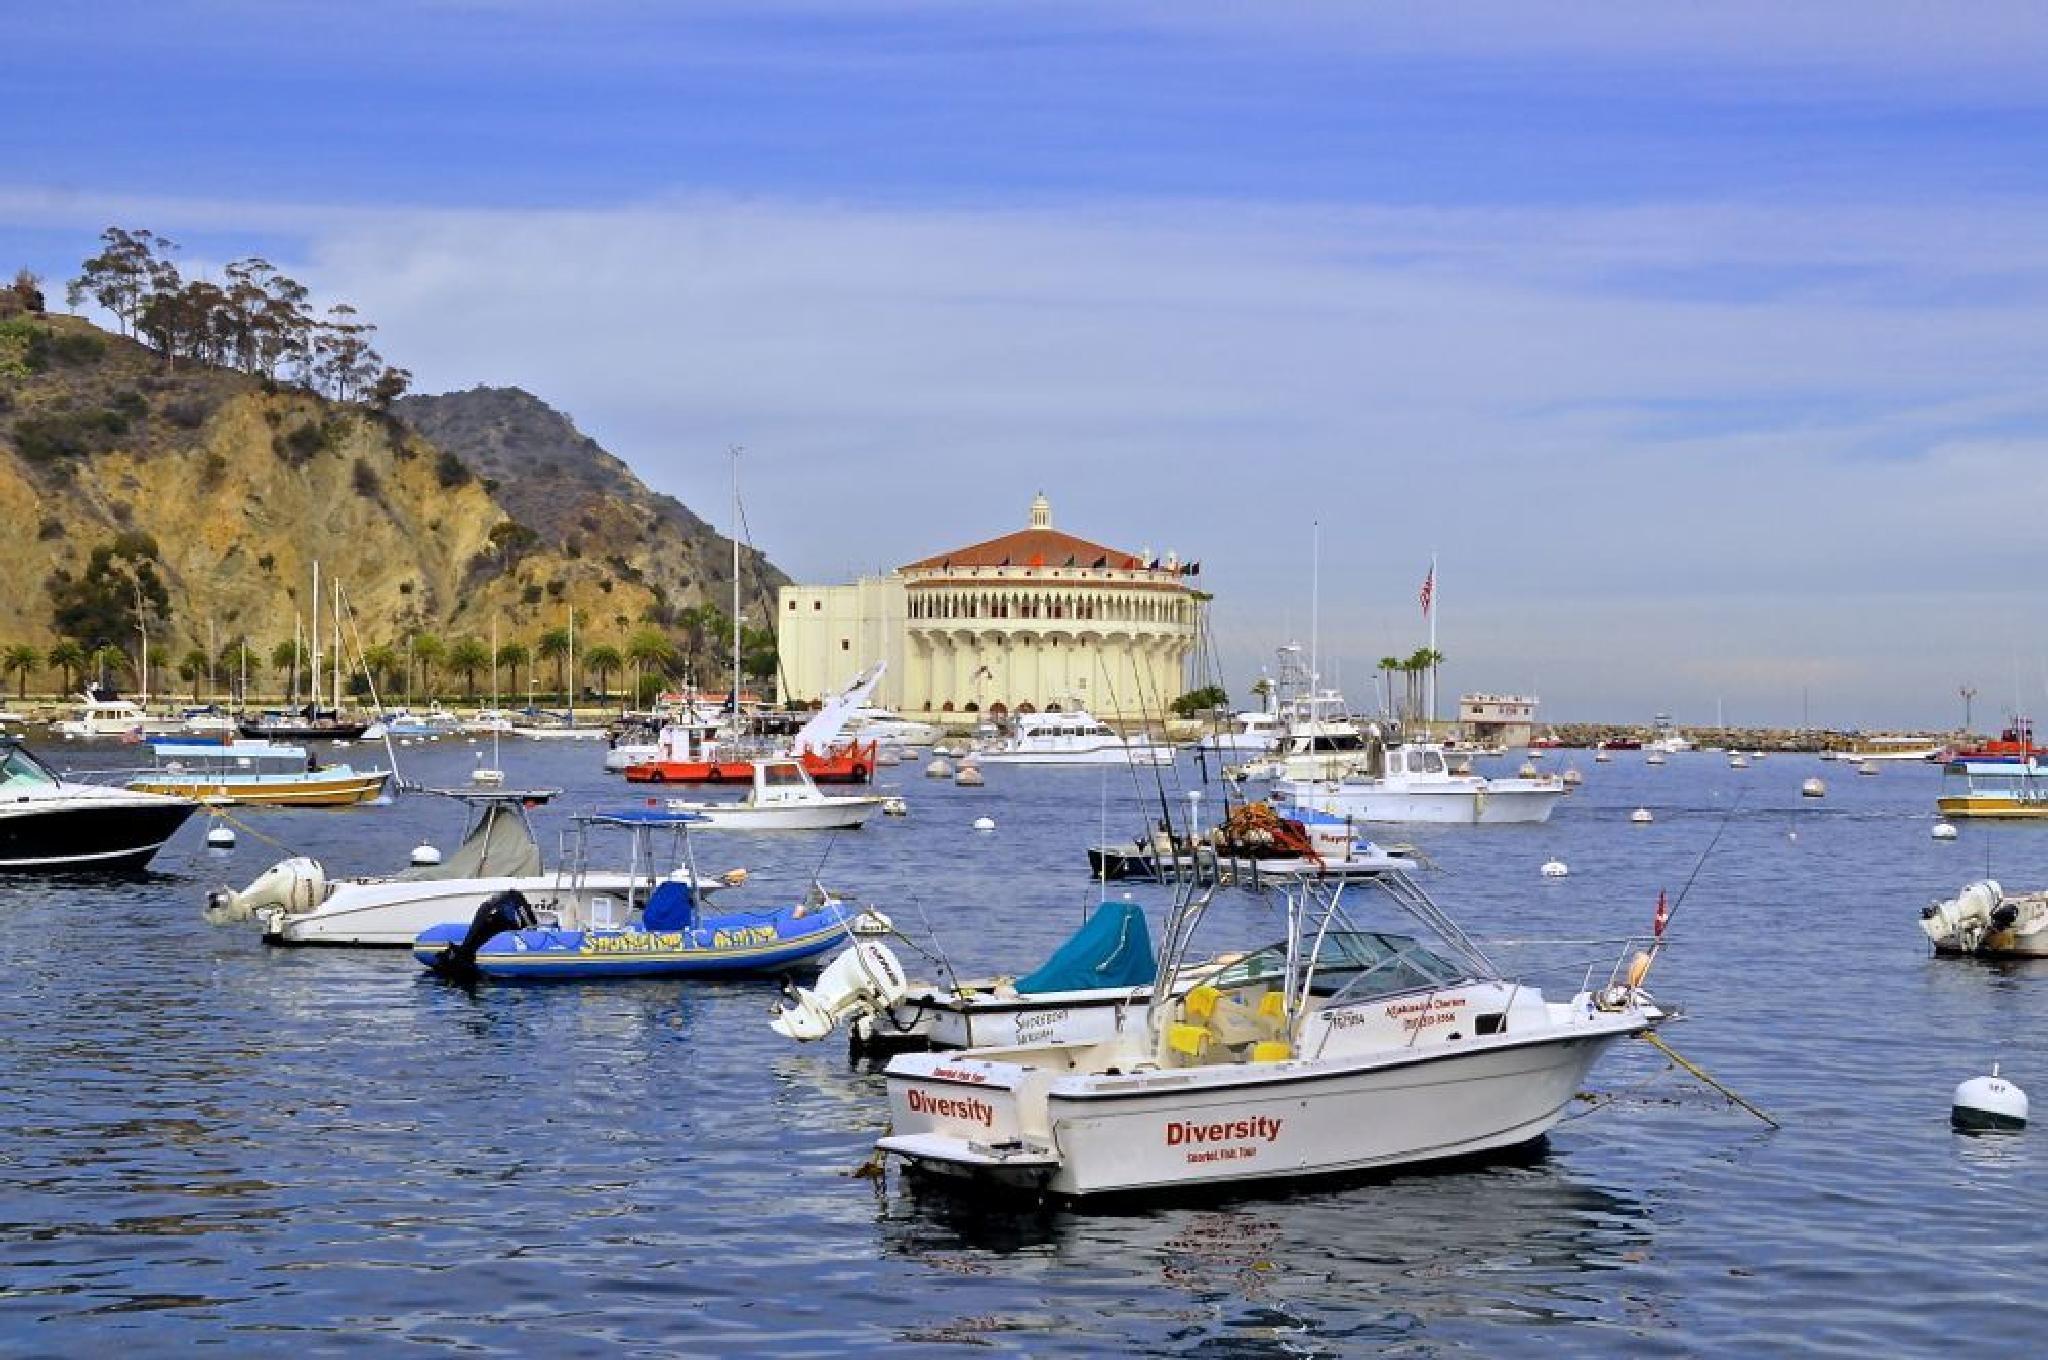 Catalina Island, California by Robert Ou